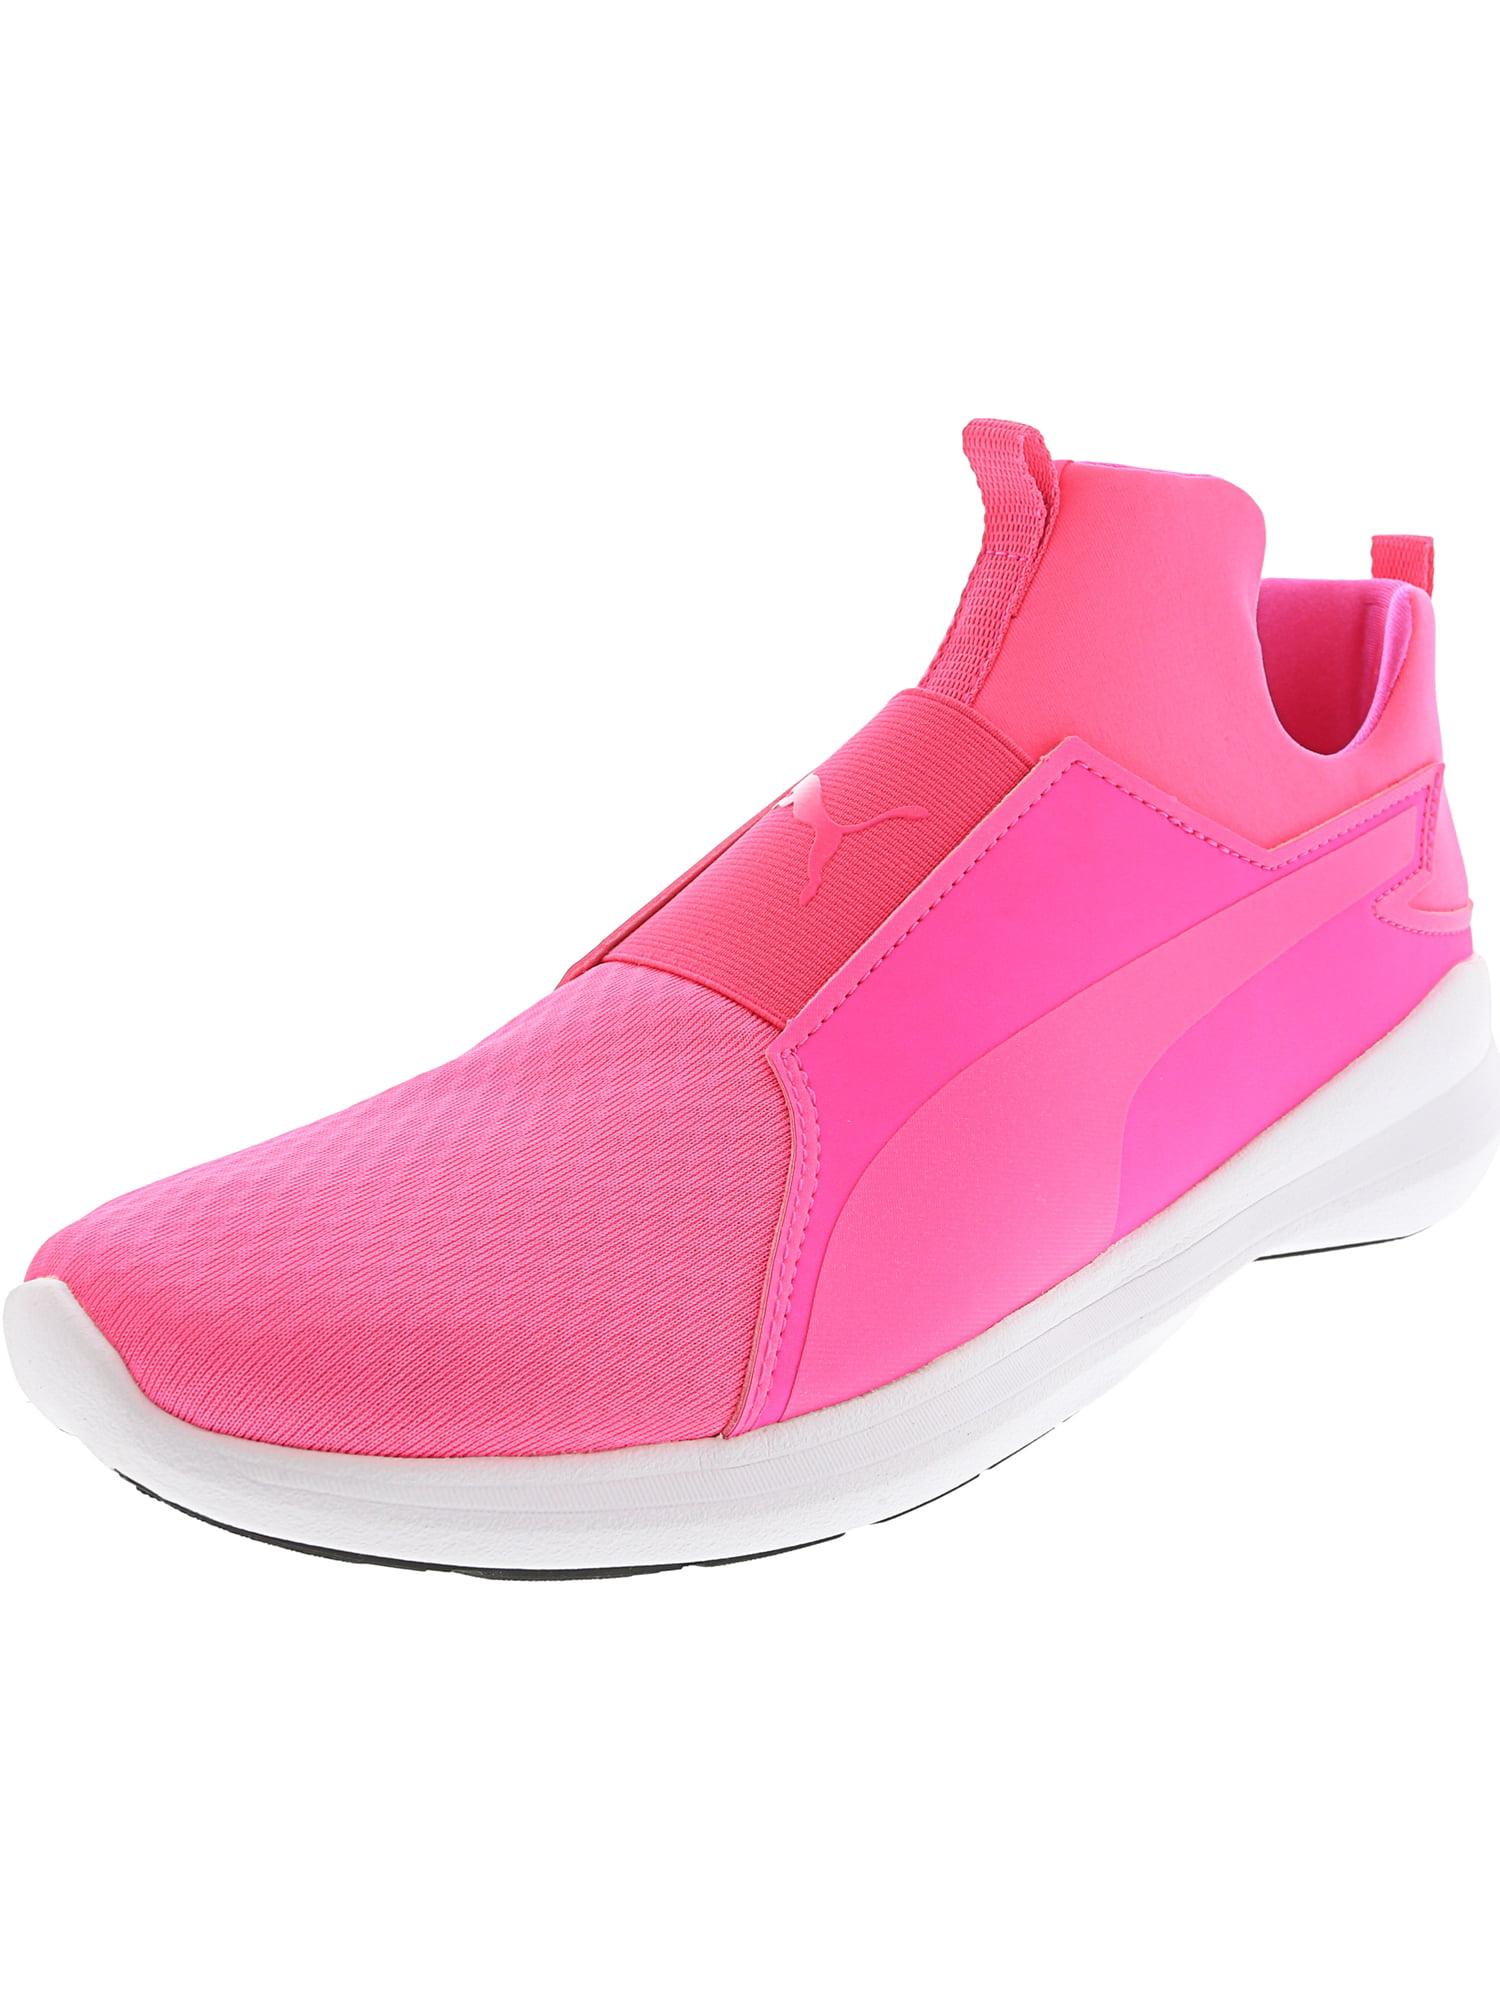 Puma Women's Rebel Mid Baja Blue / Smoky Grape Ankle-High Fabric Fashion Sneaker - 6.5M